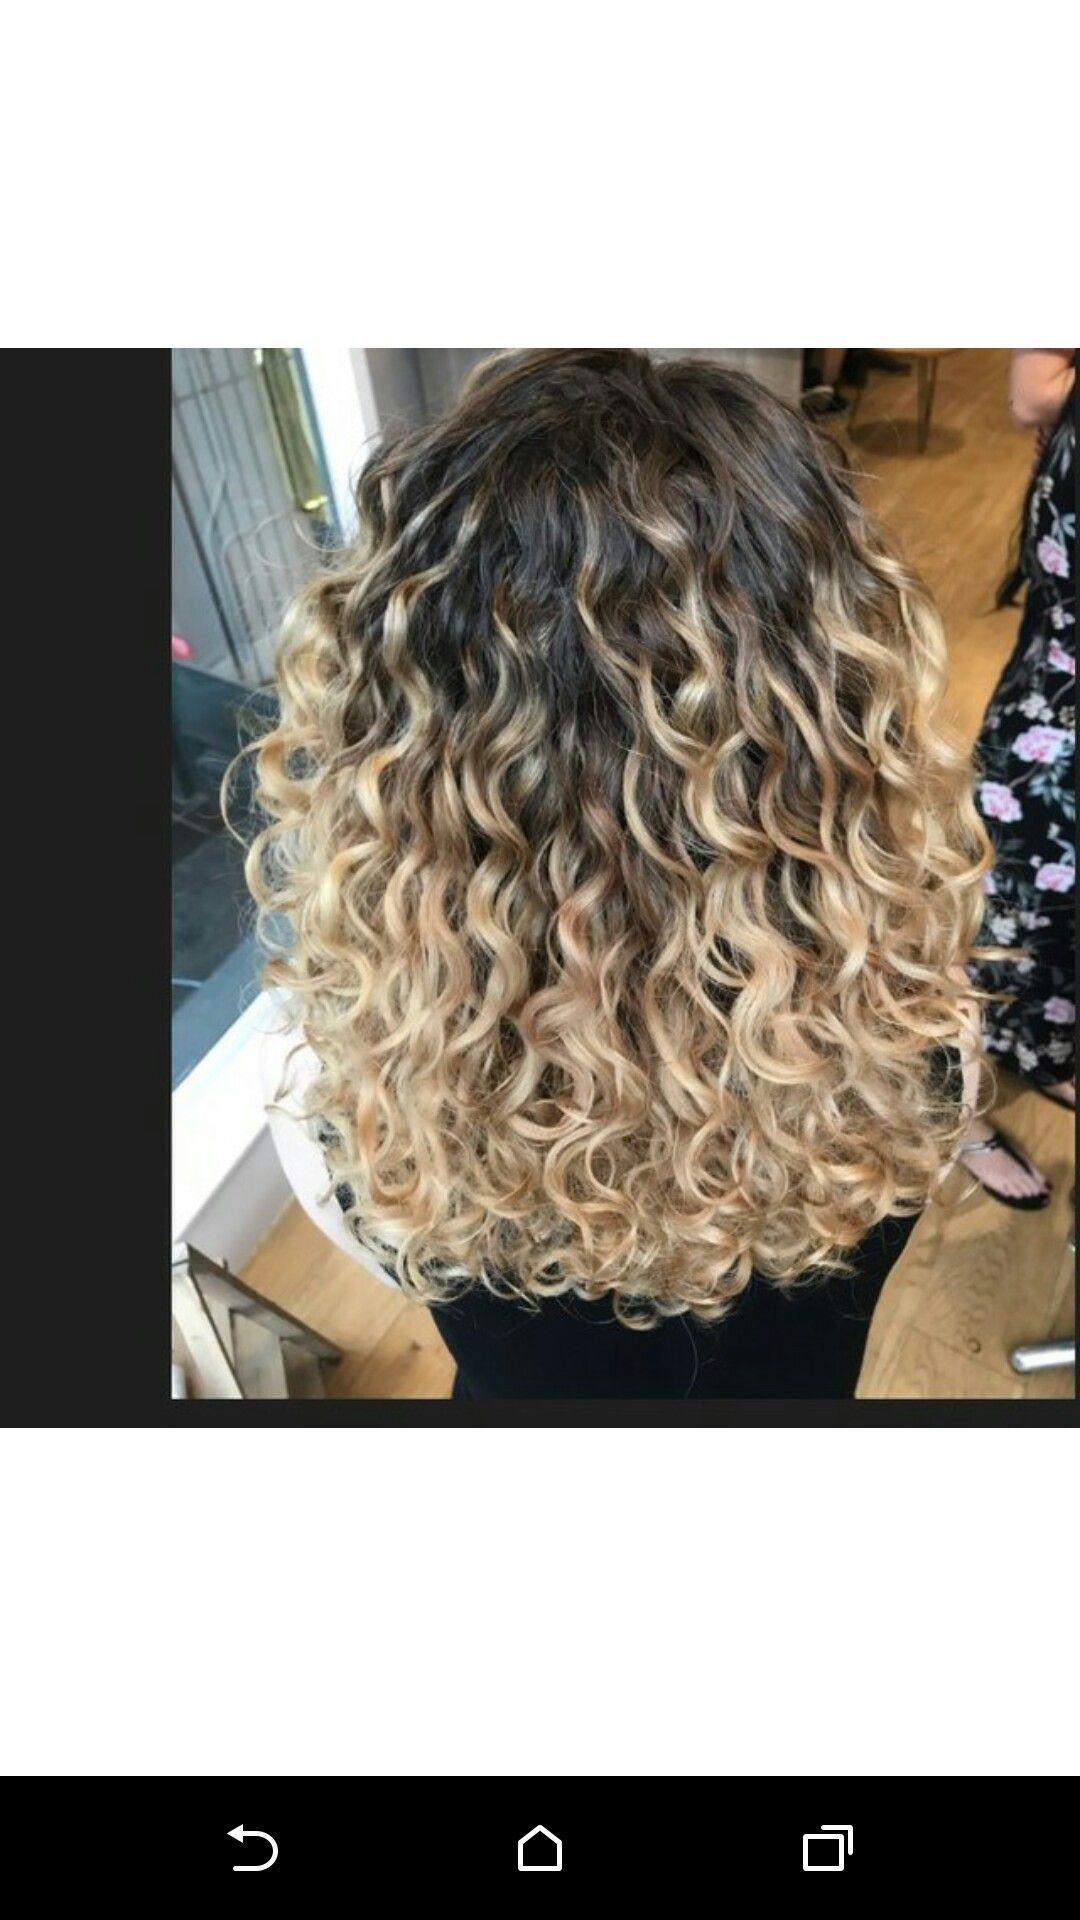 Naturally Curly Hair Blonde Ombre Balayage By Reegan At Spring Hair Salon In Birmingham Uk Http S Ombre Curly Hair Curly Balayage Hair Colored Curly Hair